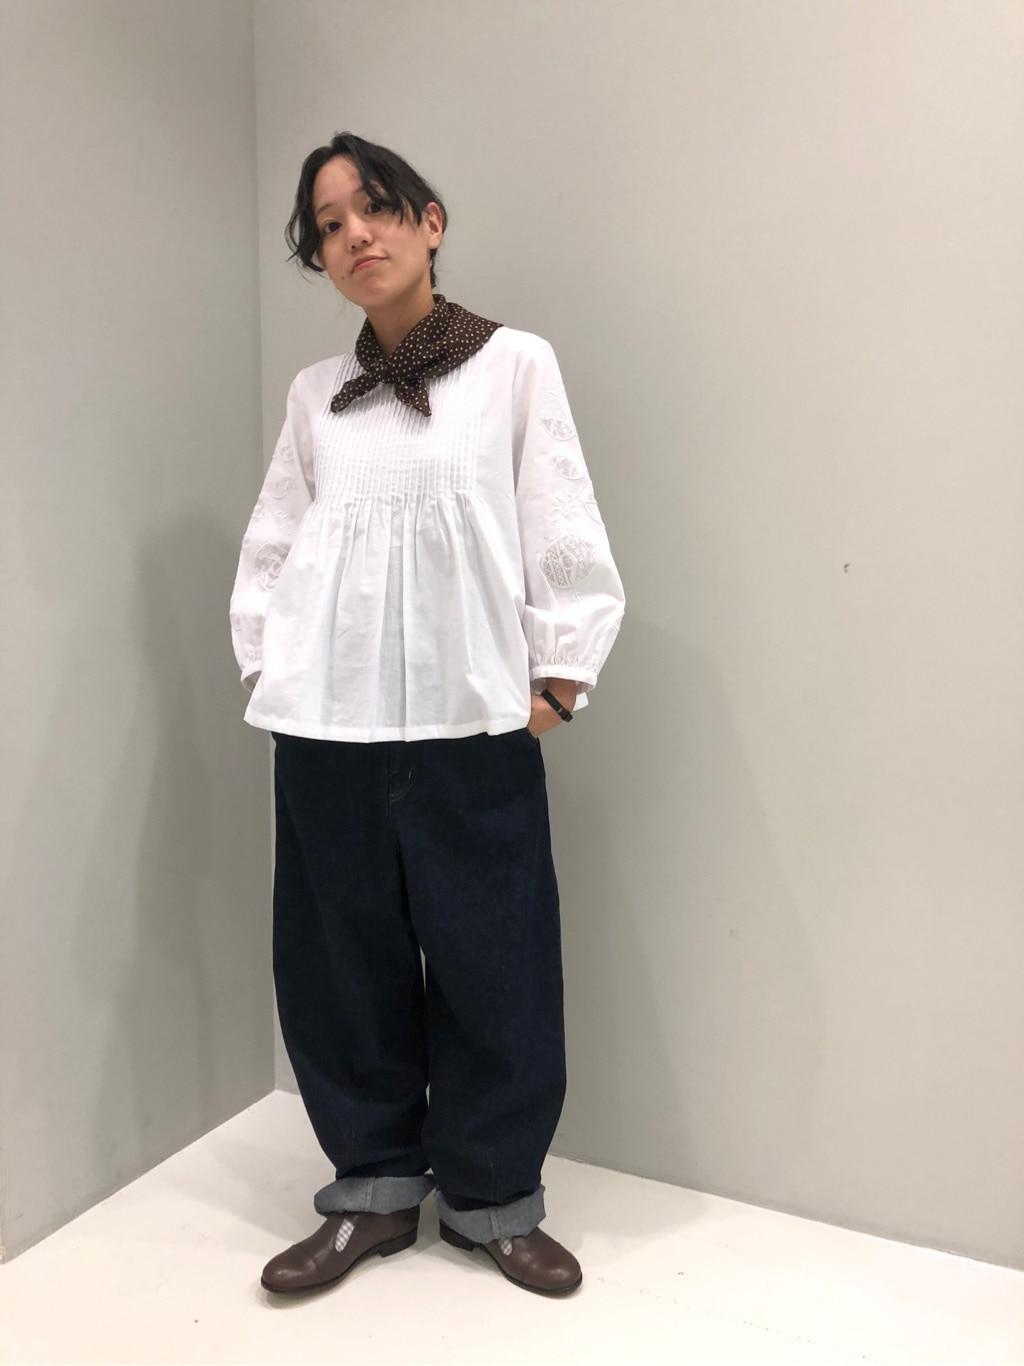 bulle de savon なんばシティ 身長:148cm 2020.08.27